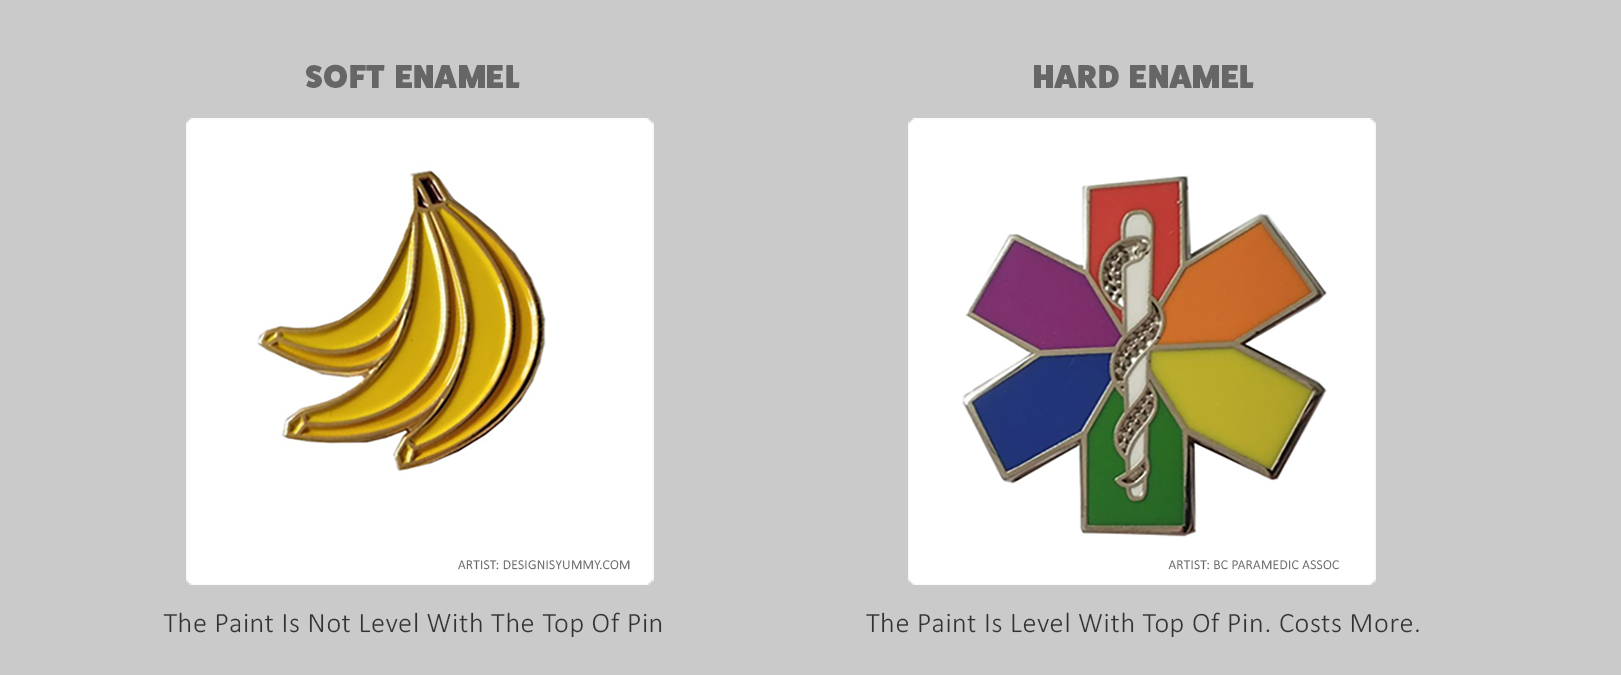 hard-enamel-versus-soft-enamel-pins-difference-2019